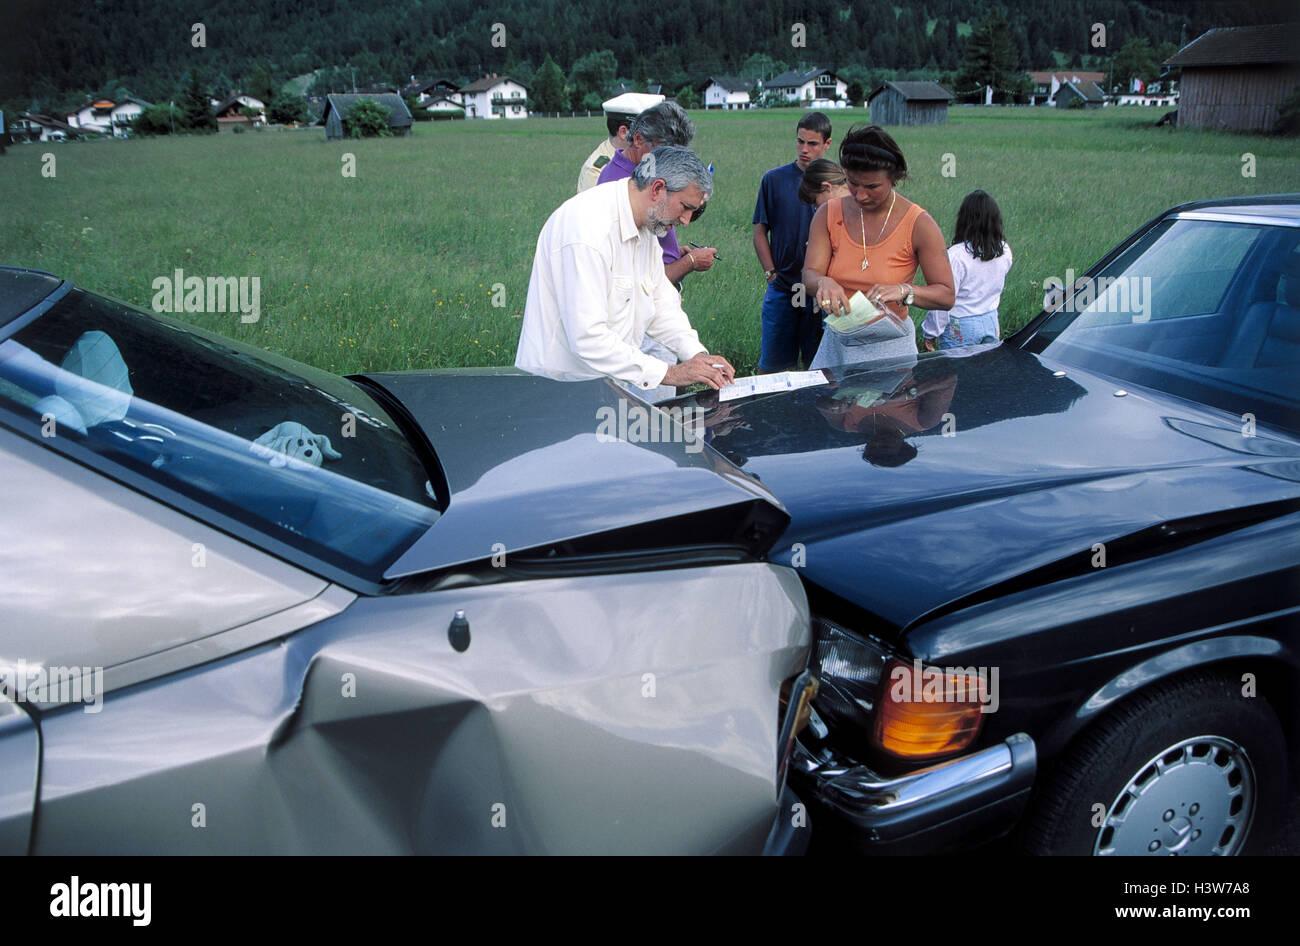 Accident Protocol Stockfotos & Accident Protocol Bilder - Alamy